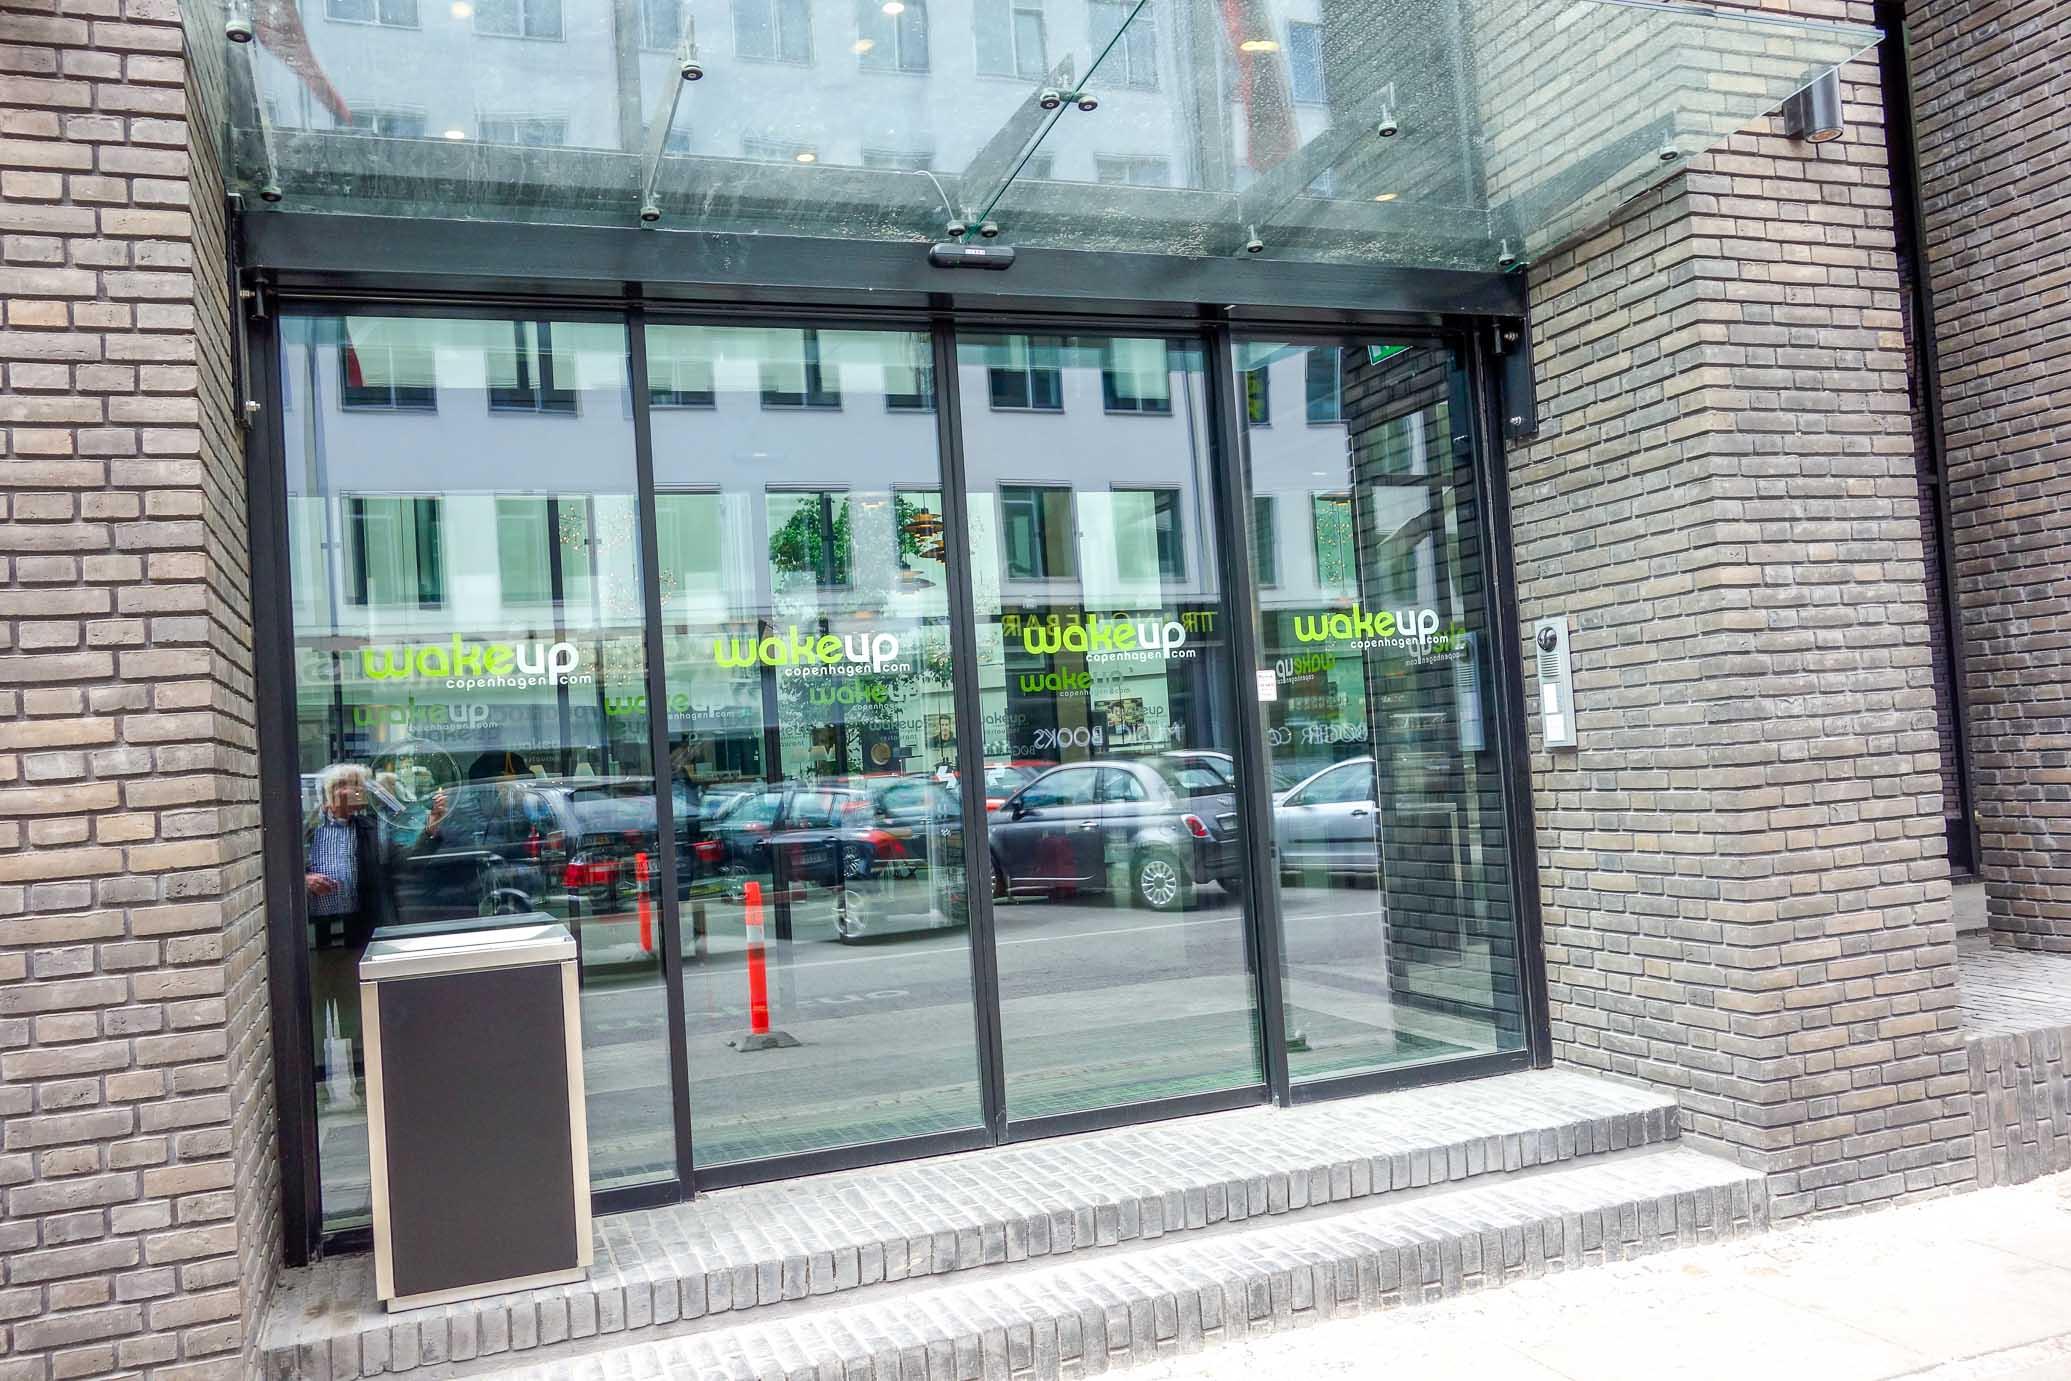 Entrance of Borgergrade Wakeup in Copenhagen